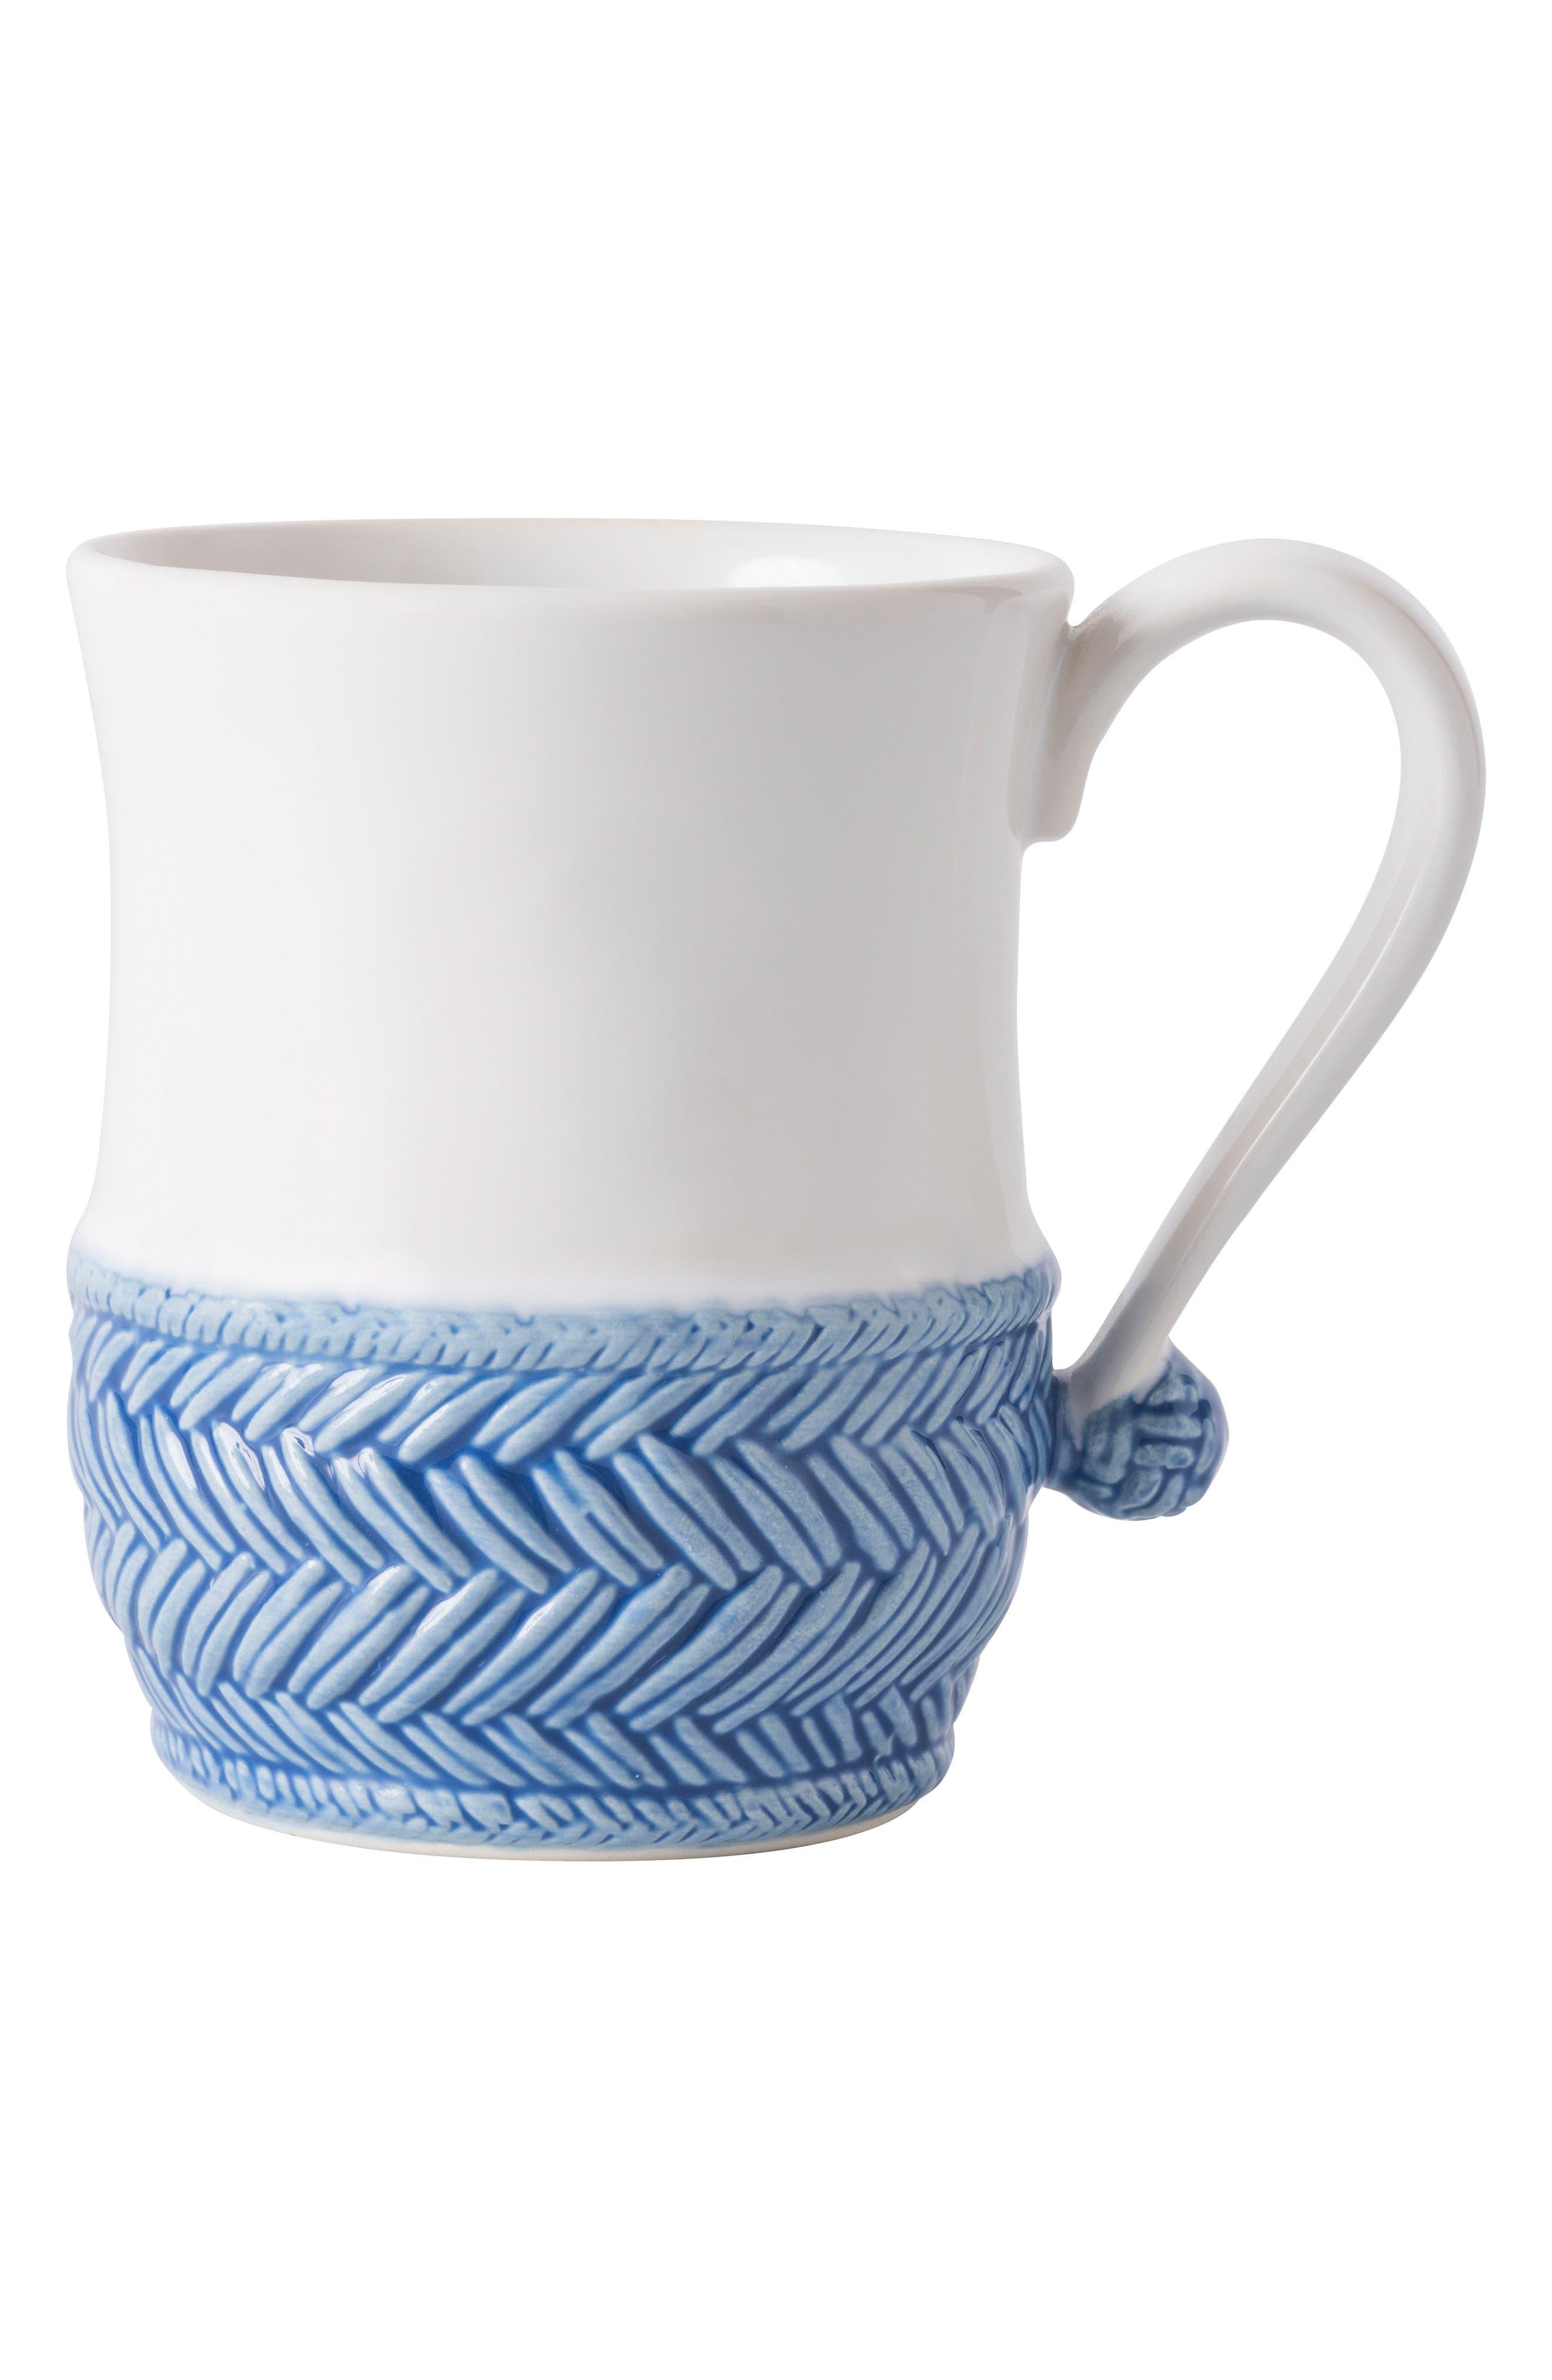 Le Panier Mug,                             Main thumbnail 1, color,                             WHITEWASH/ DELFT BLUE